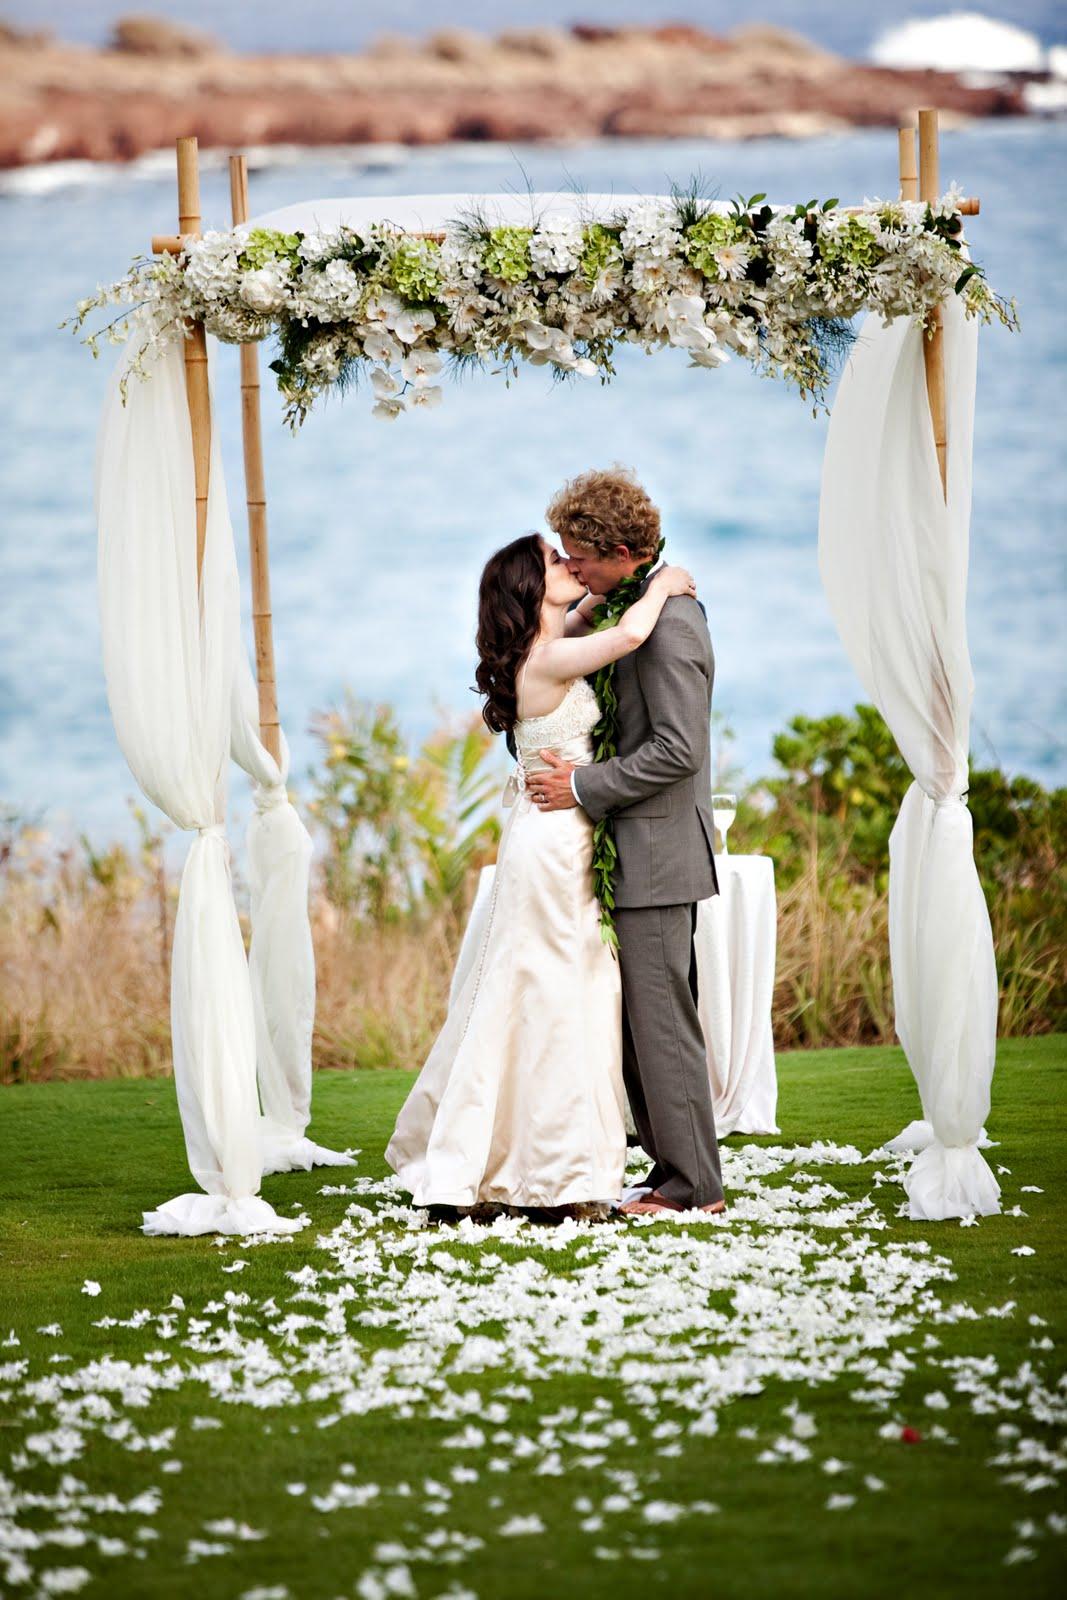 Destination Weddings - Destination Wedding Hawaii: Love on ...